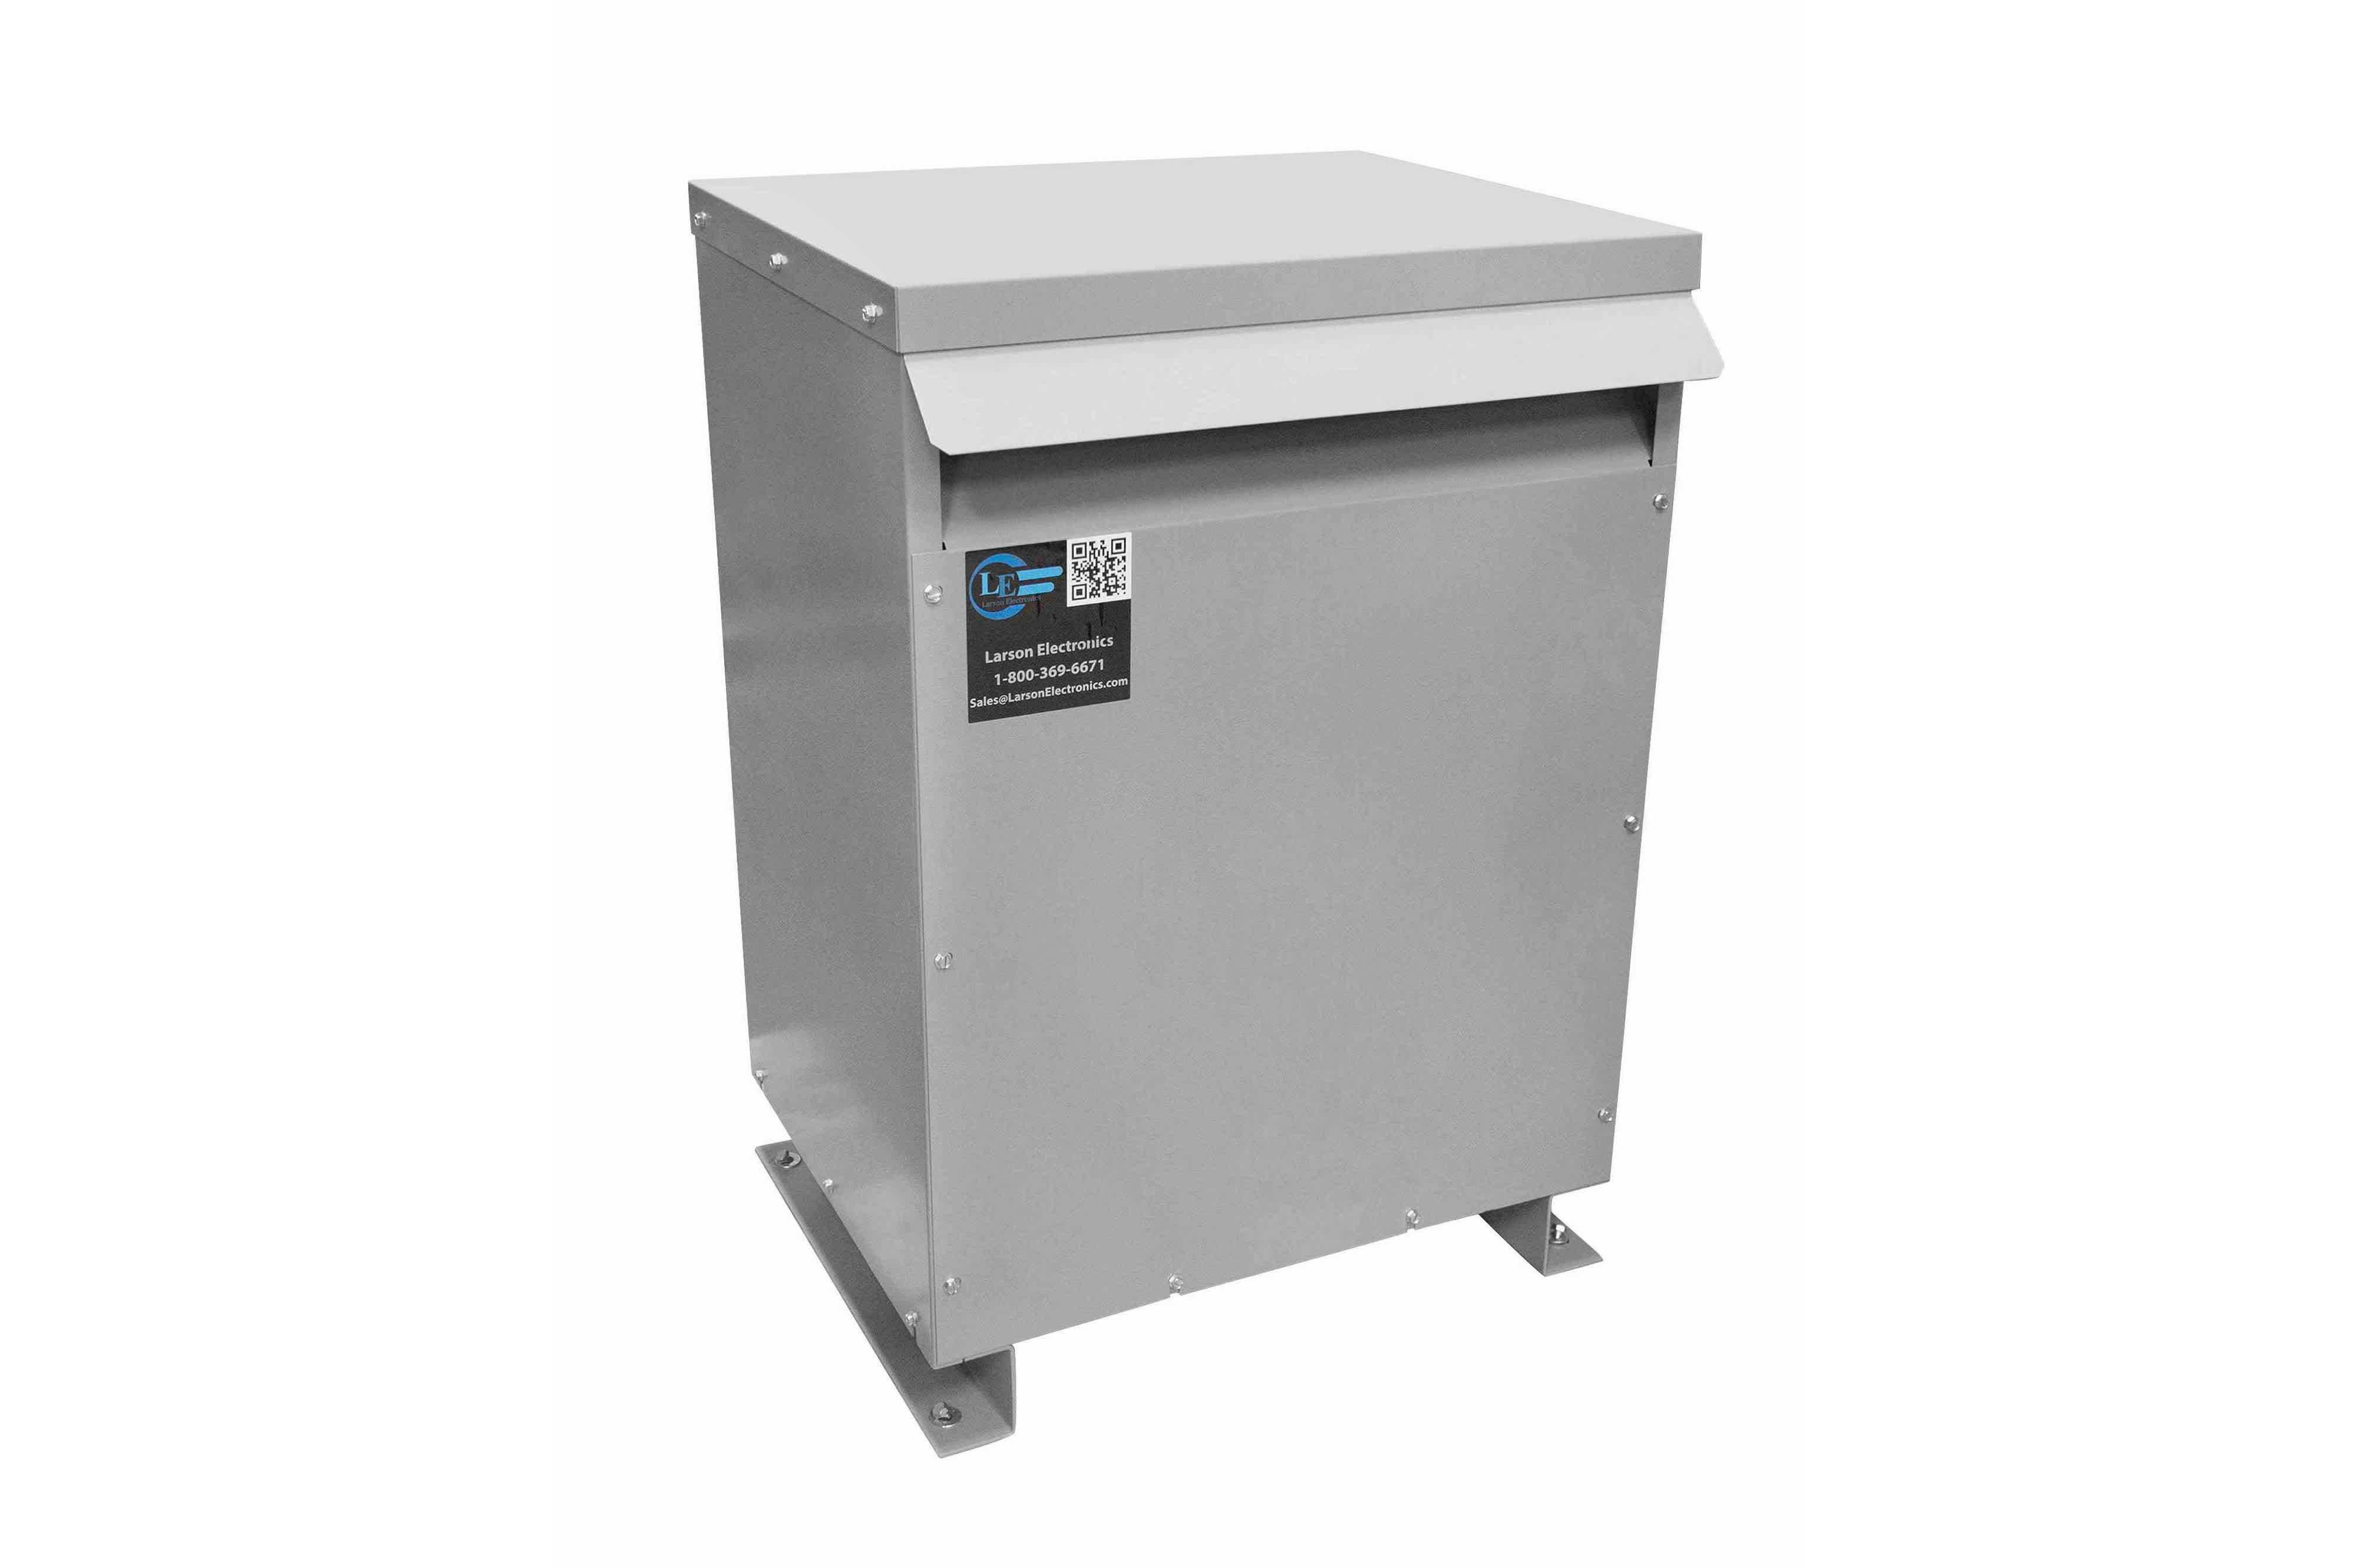 110 kVA 3PH Isolation Transformer, 240V Wye Primary, 380Y/220 Wye-N Secondary, N3R, Ventilated, 60 Hz